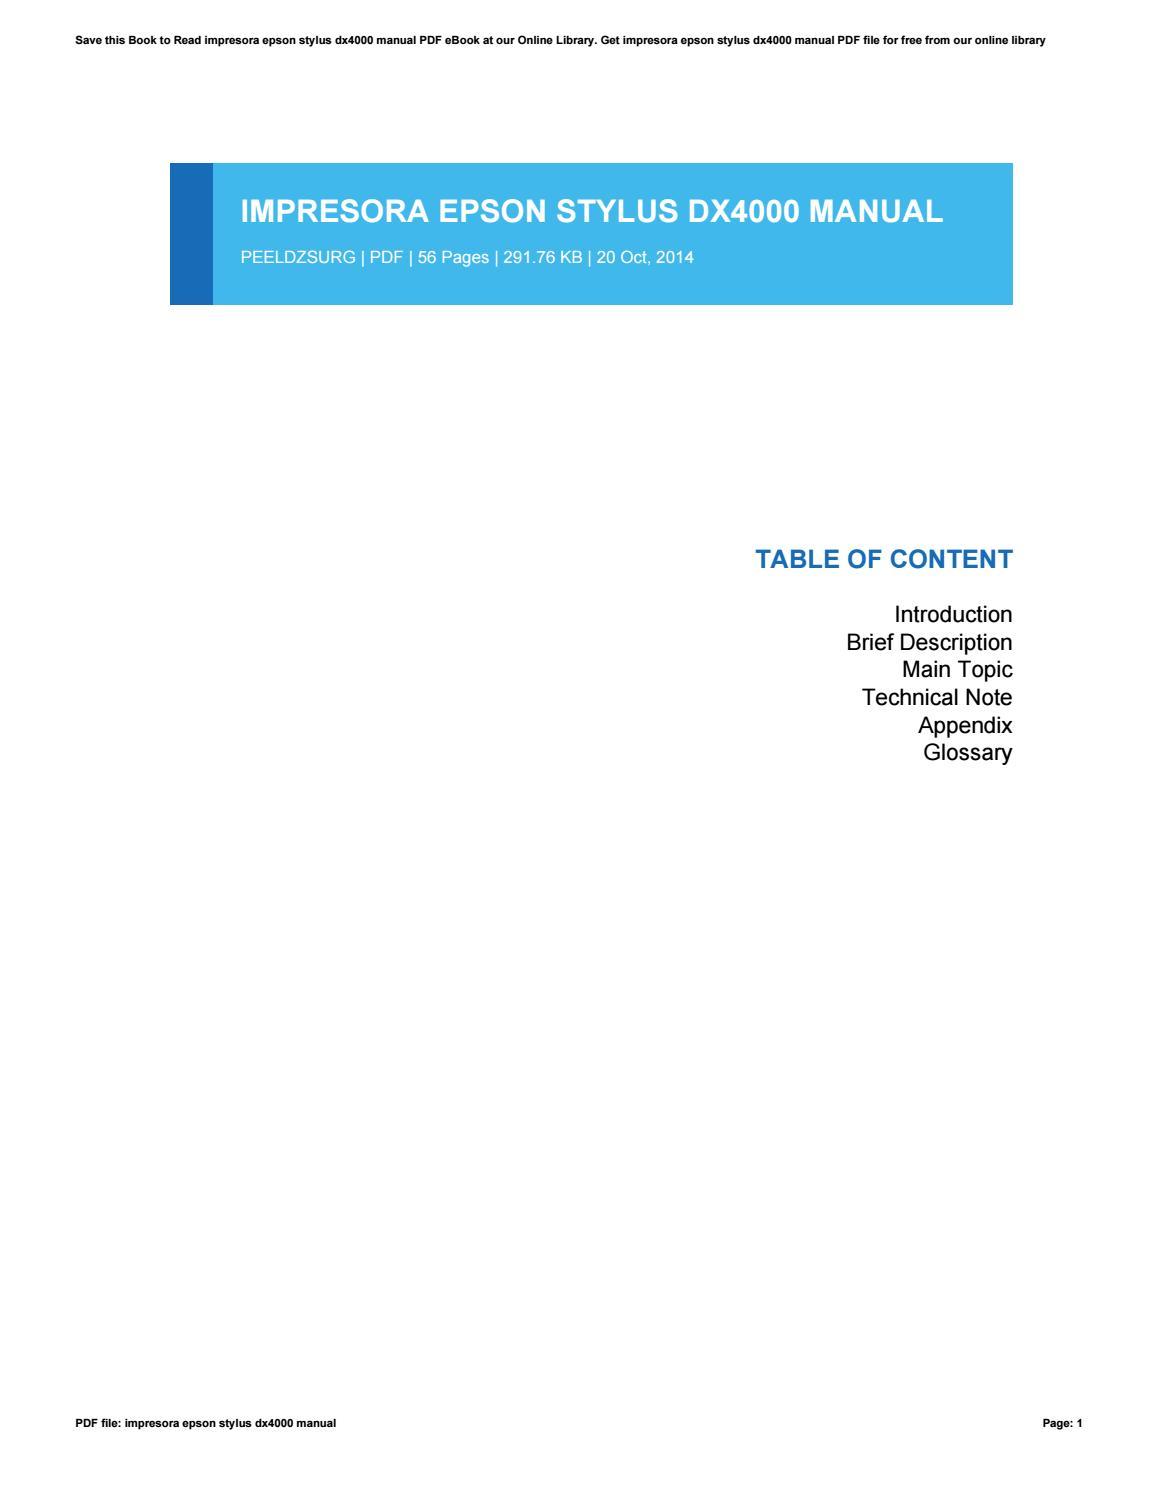 epson stylus dx4000 manual